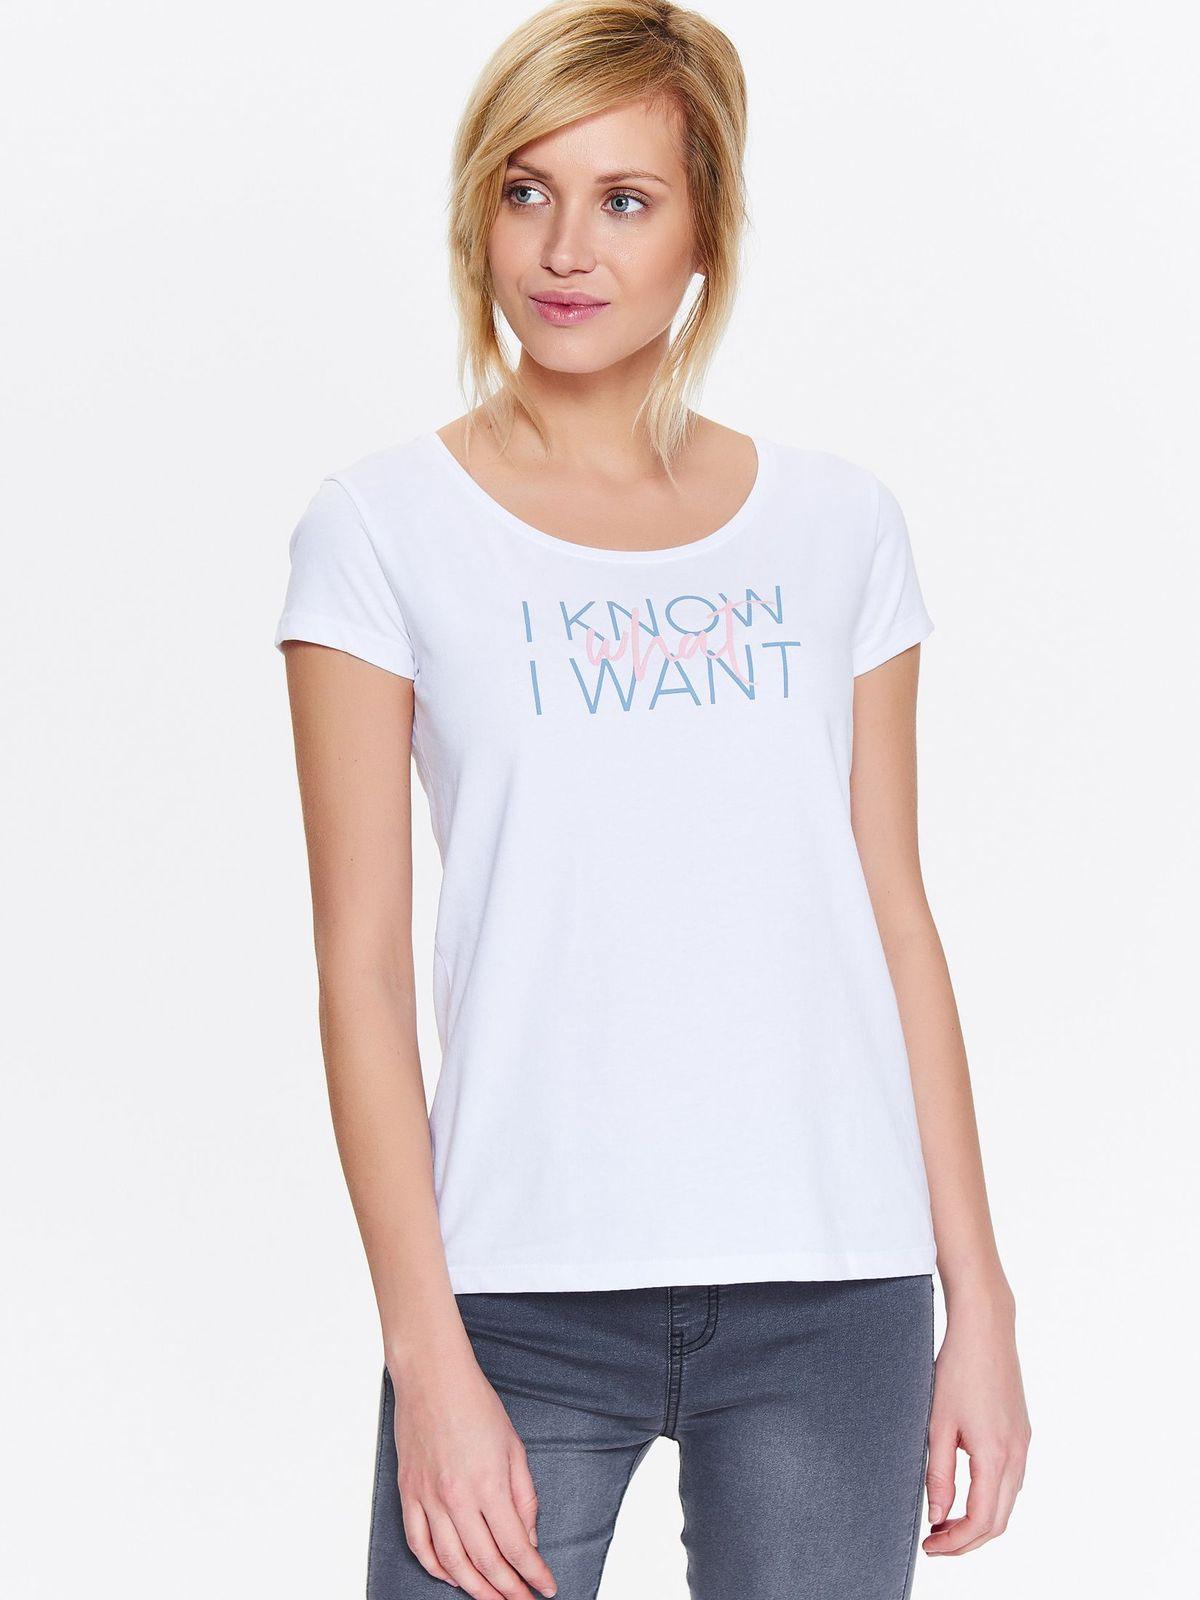 DRYWASH DRYWASH t-shirt με print